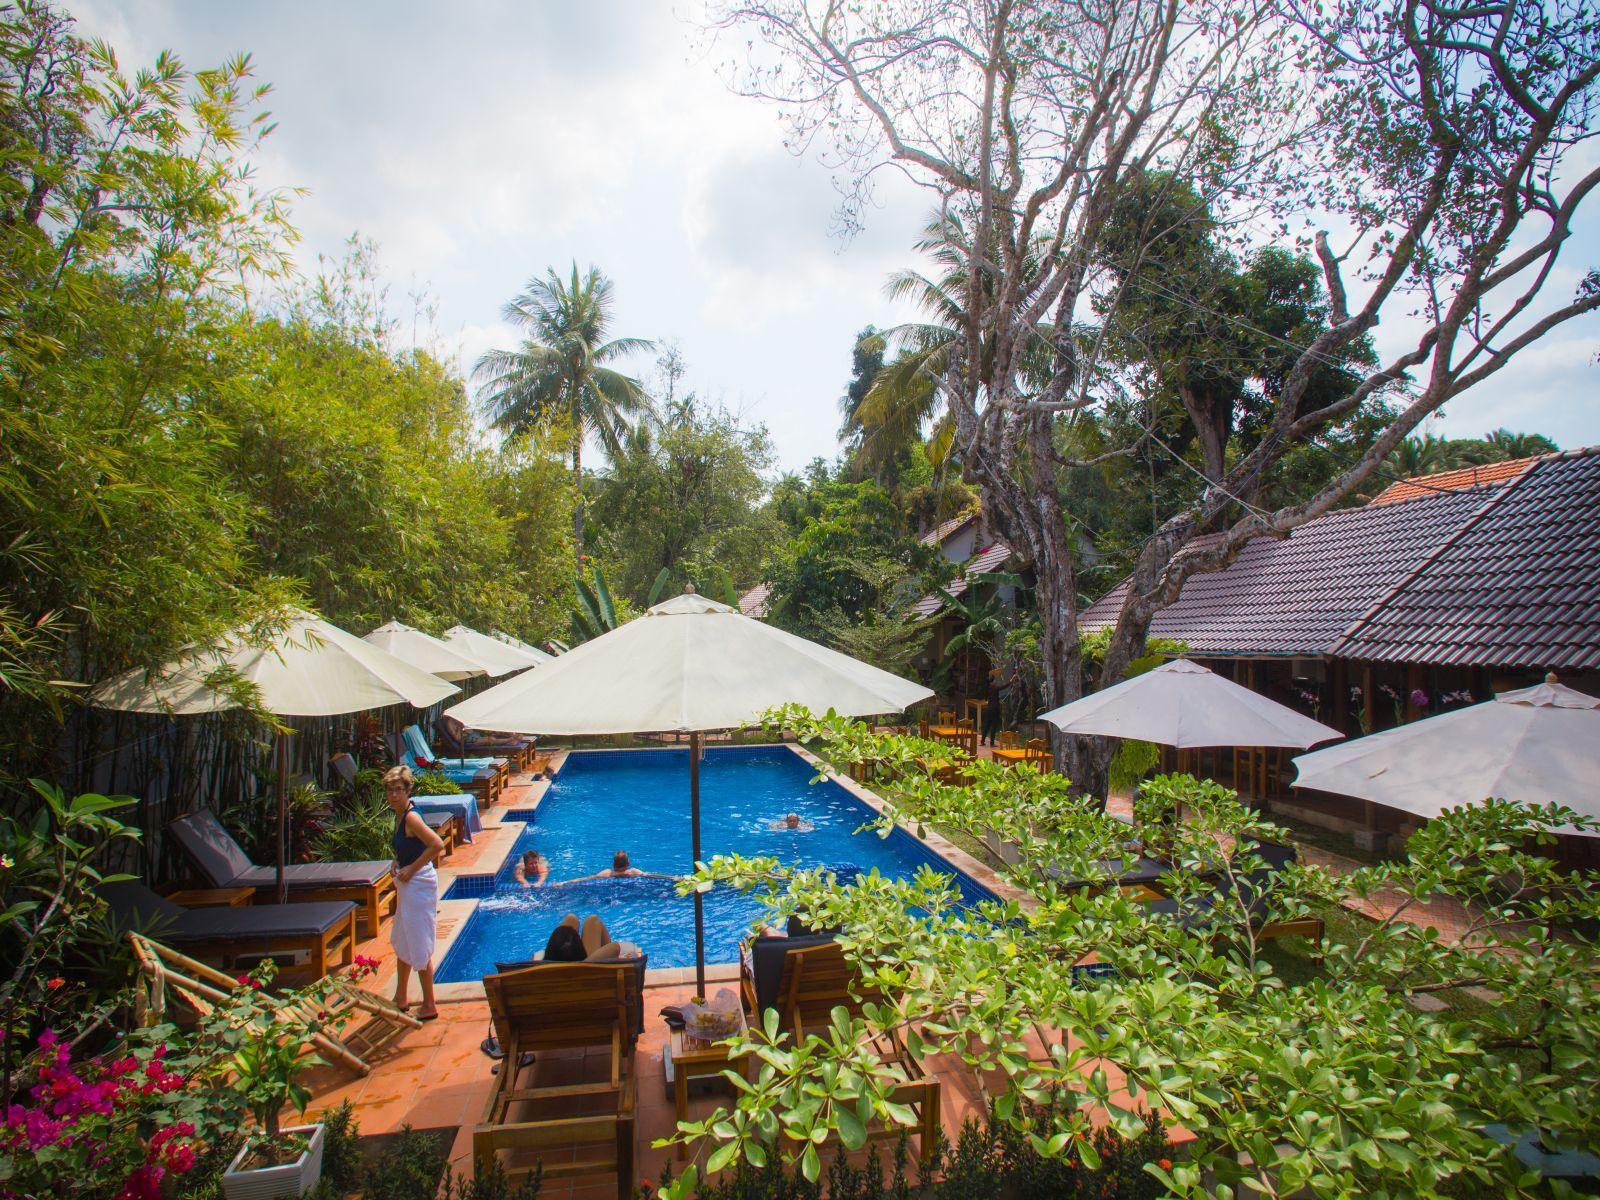 Lamer Resort Phu Quoc - Hotell och Boende i Vietnam , Phu Quoc Island